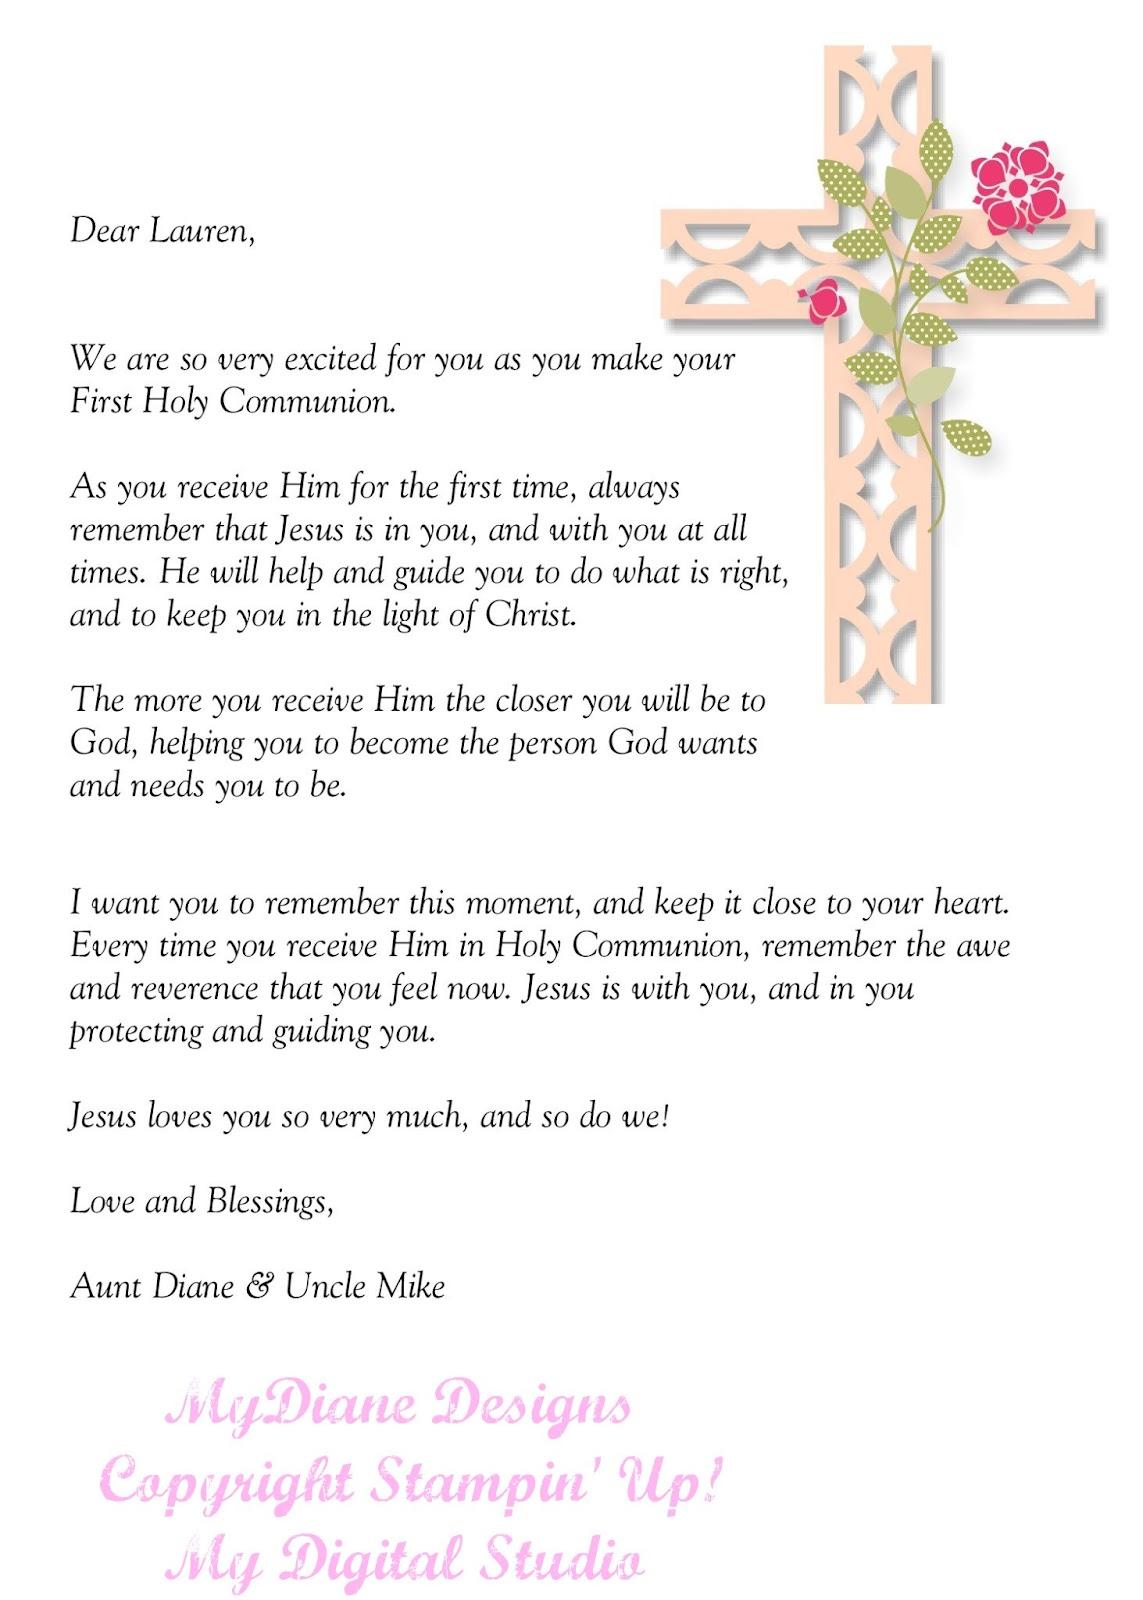 MyDiane Designs: Holy Communion Letter